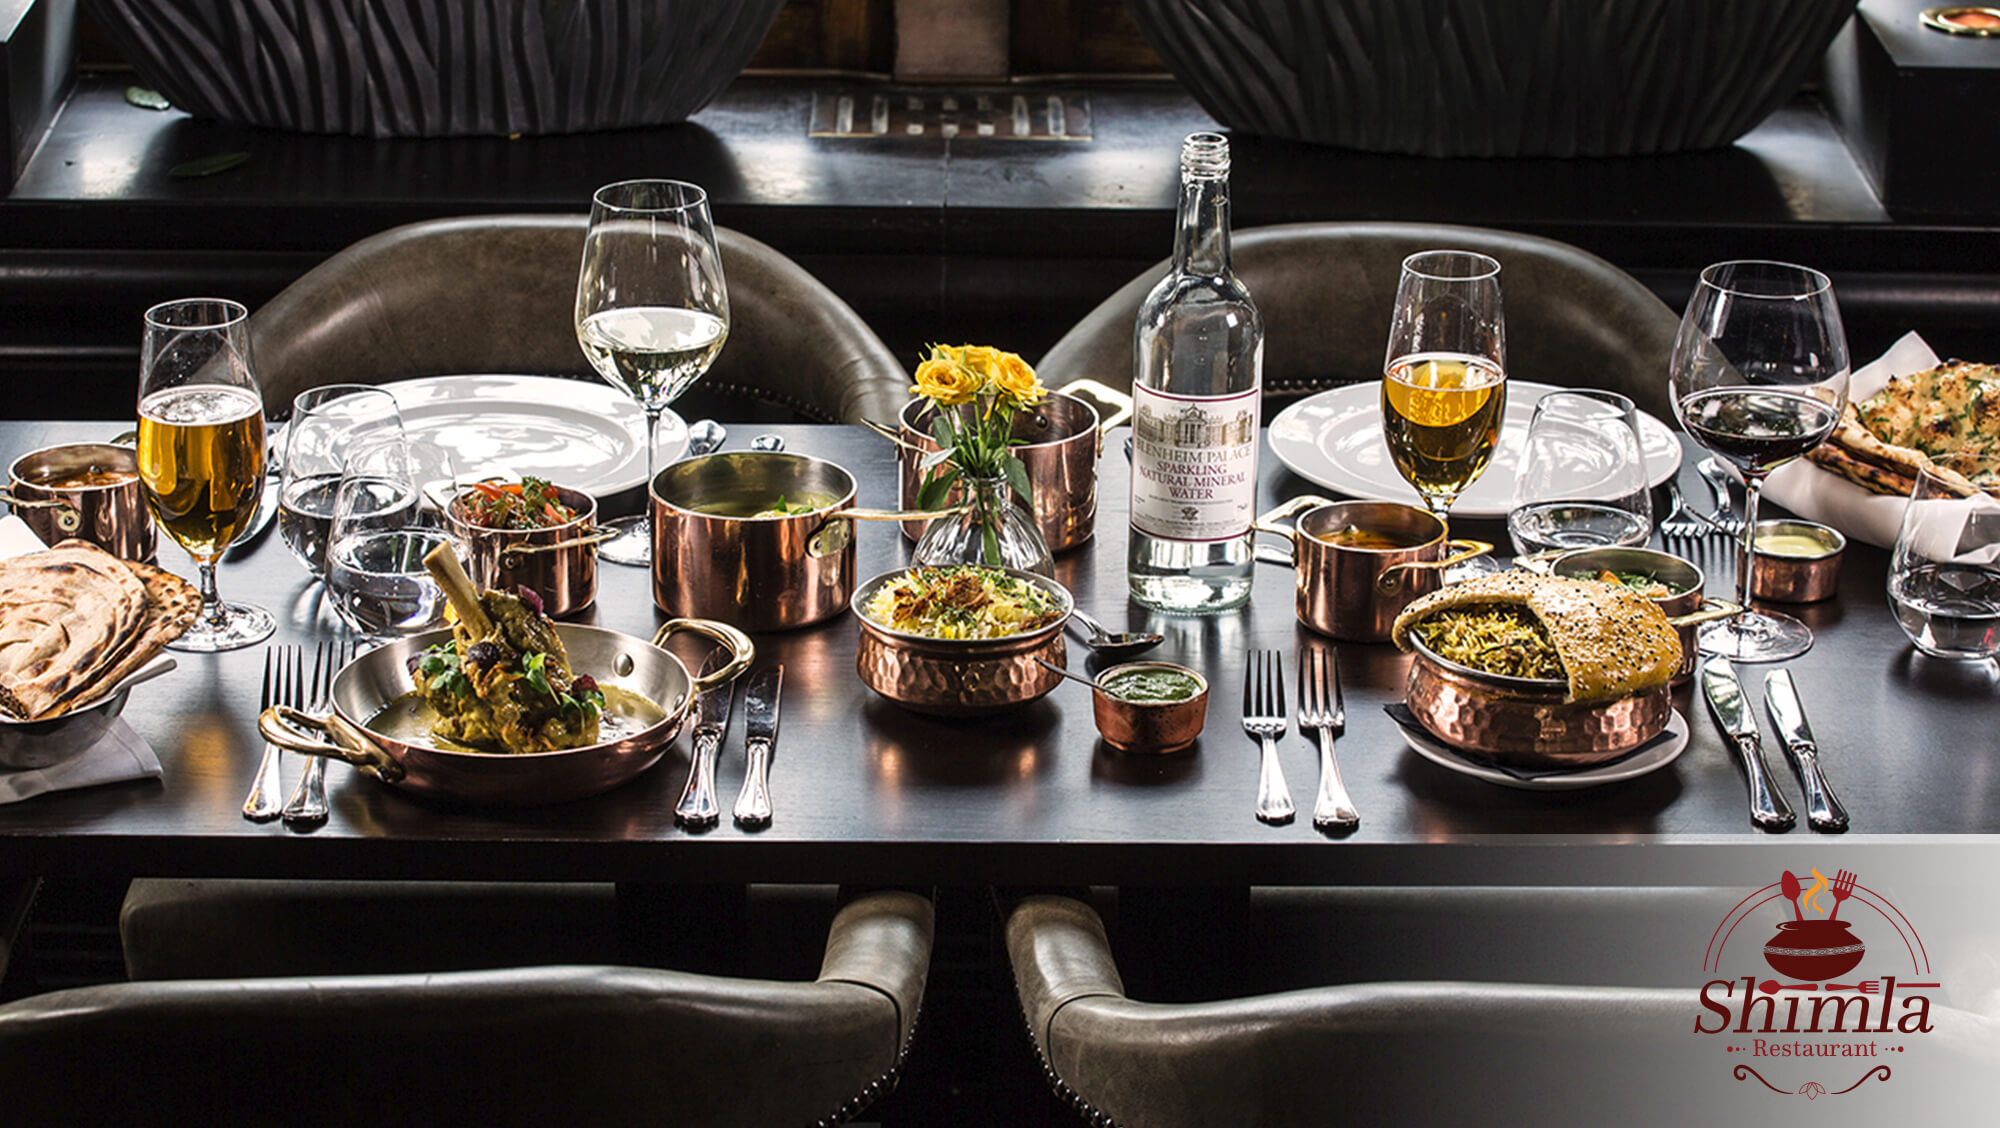 Brandcrock-shimla restaurant-BrandCrock-portfolio-menu-img